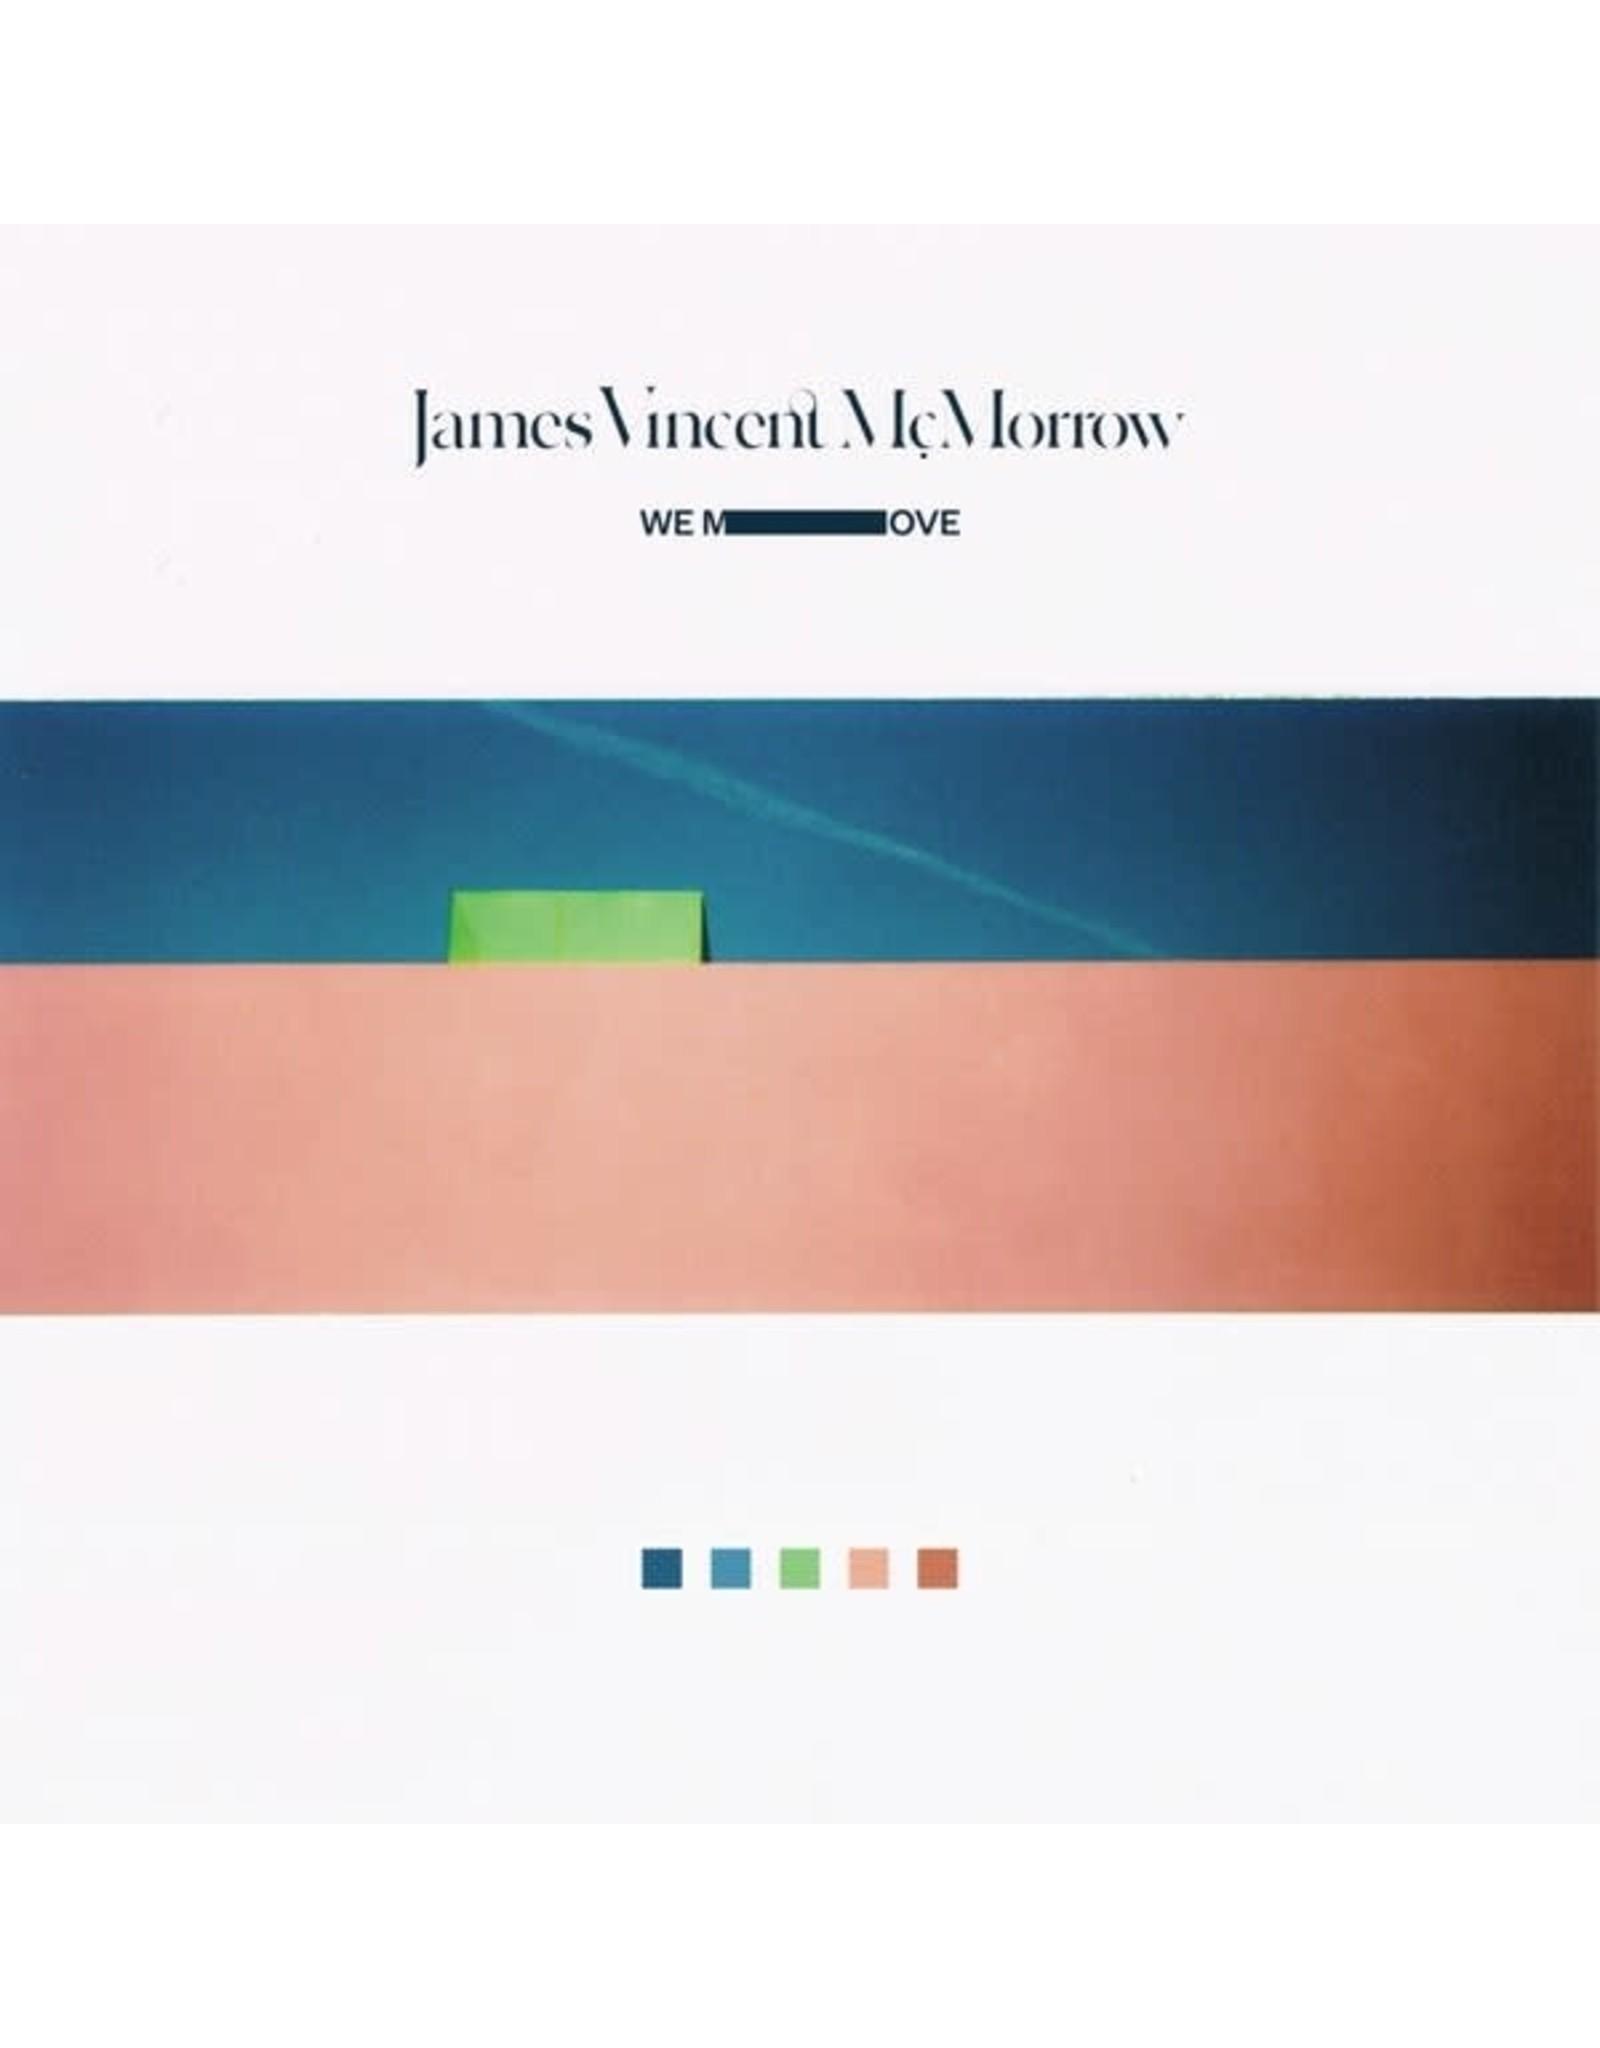 McMorrow, James Vincent - We Move CD